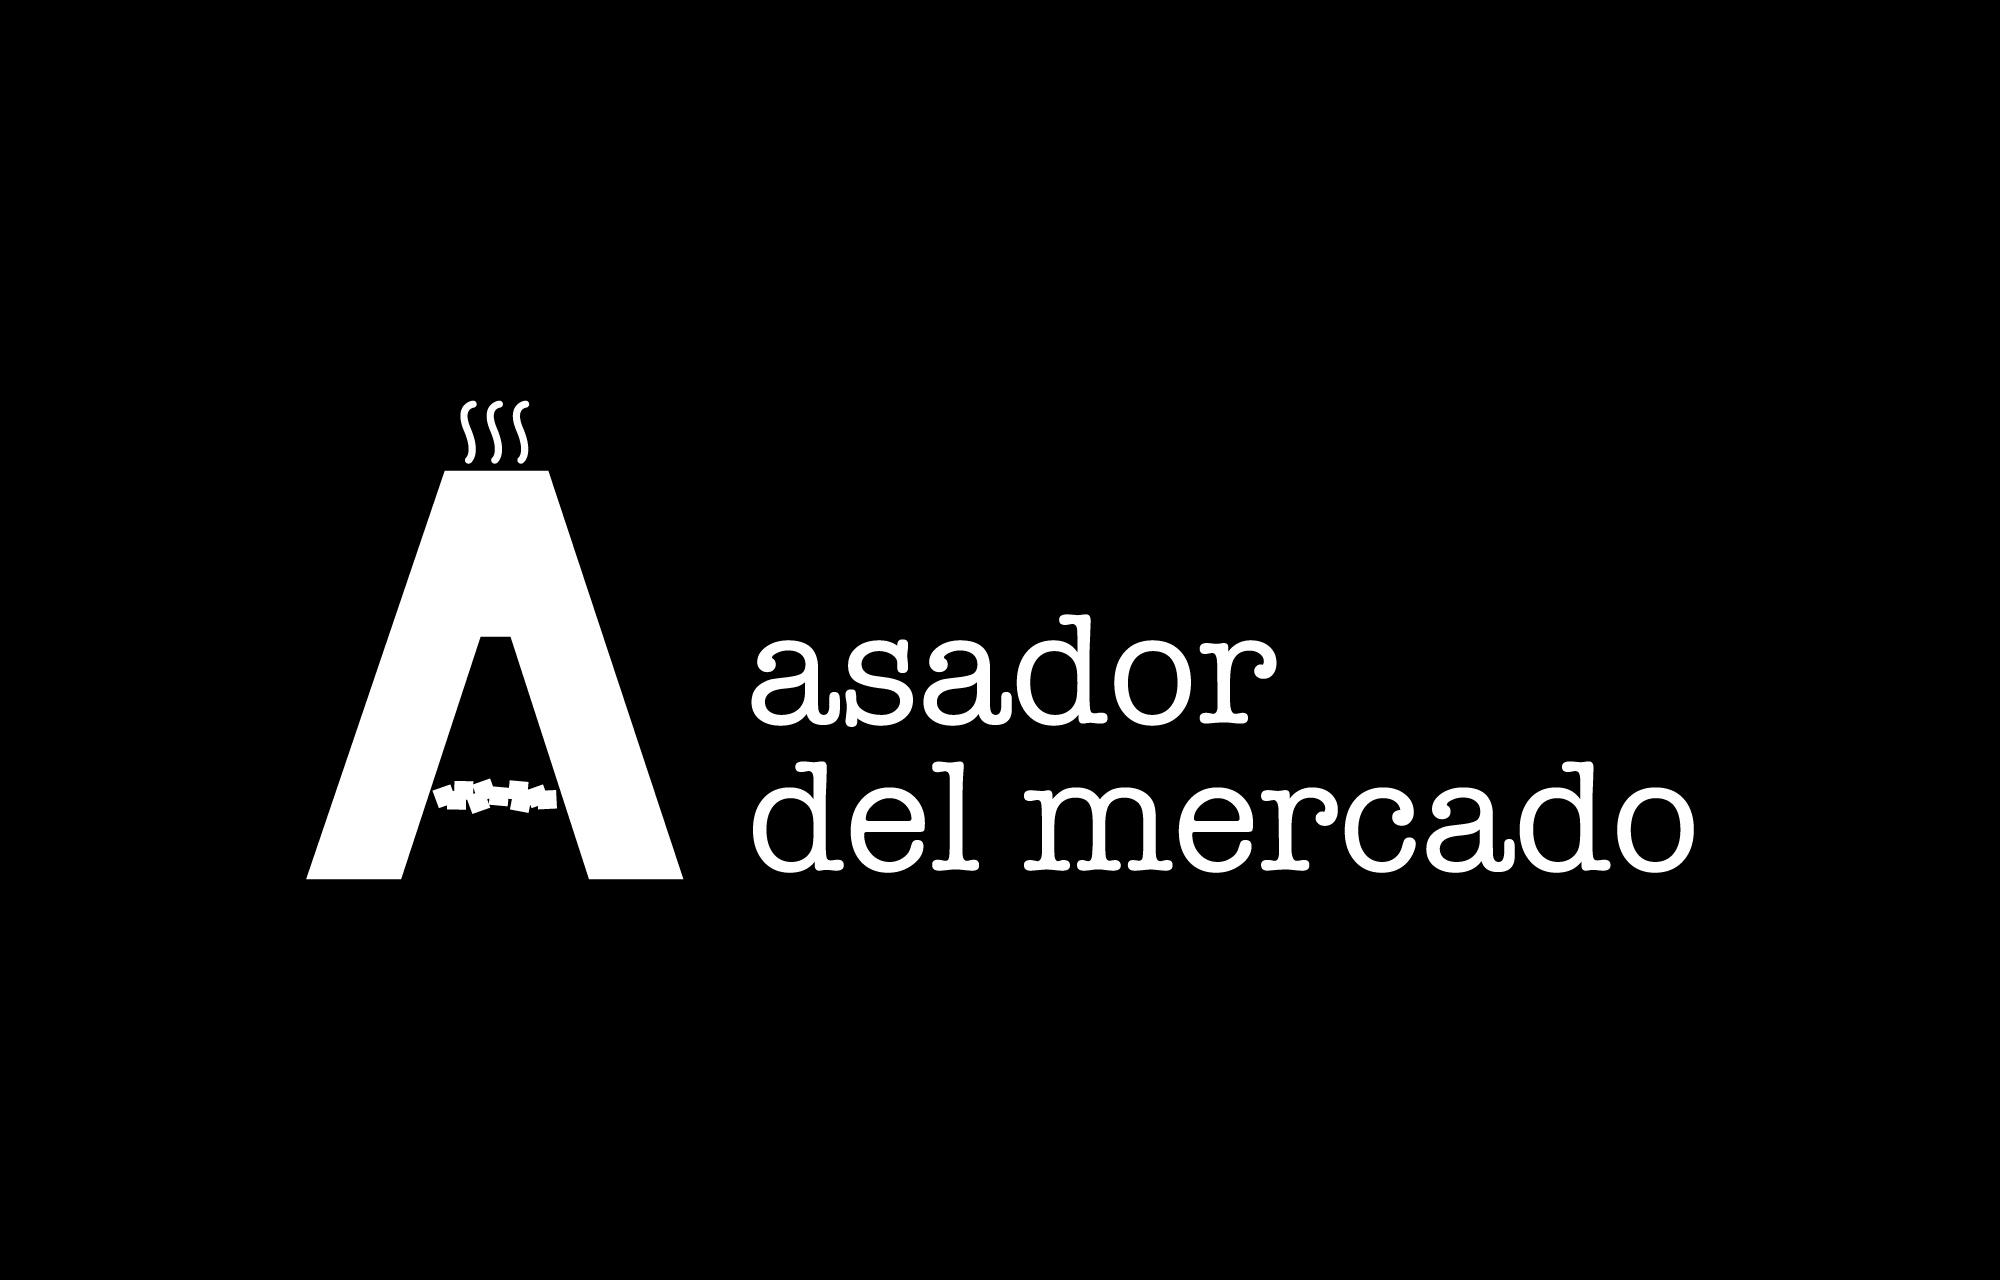 THE OFFICE_asador del mercado09.jpg